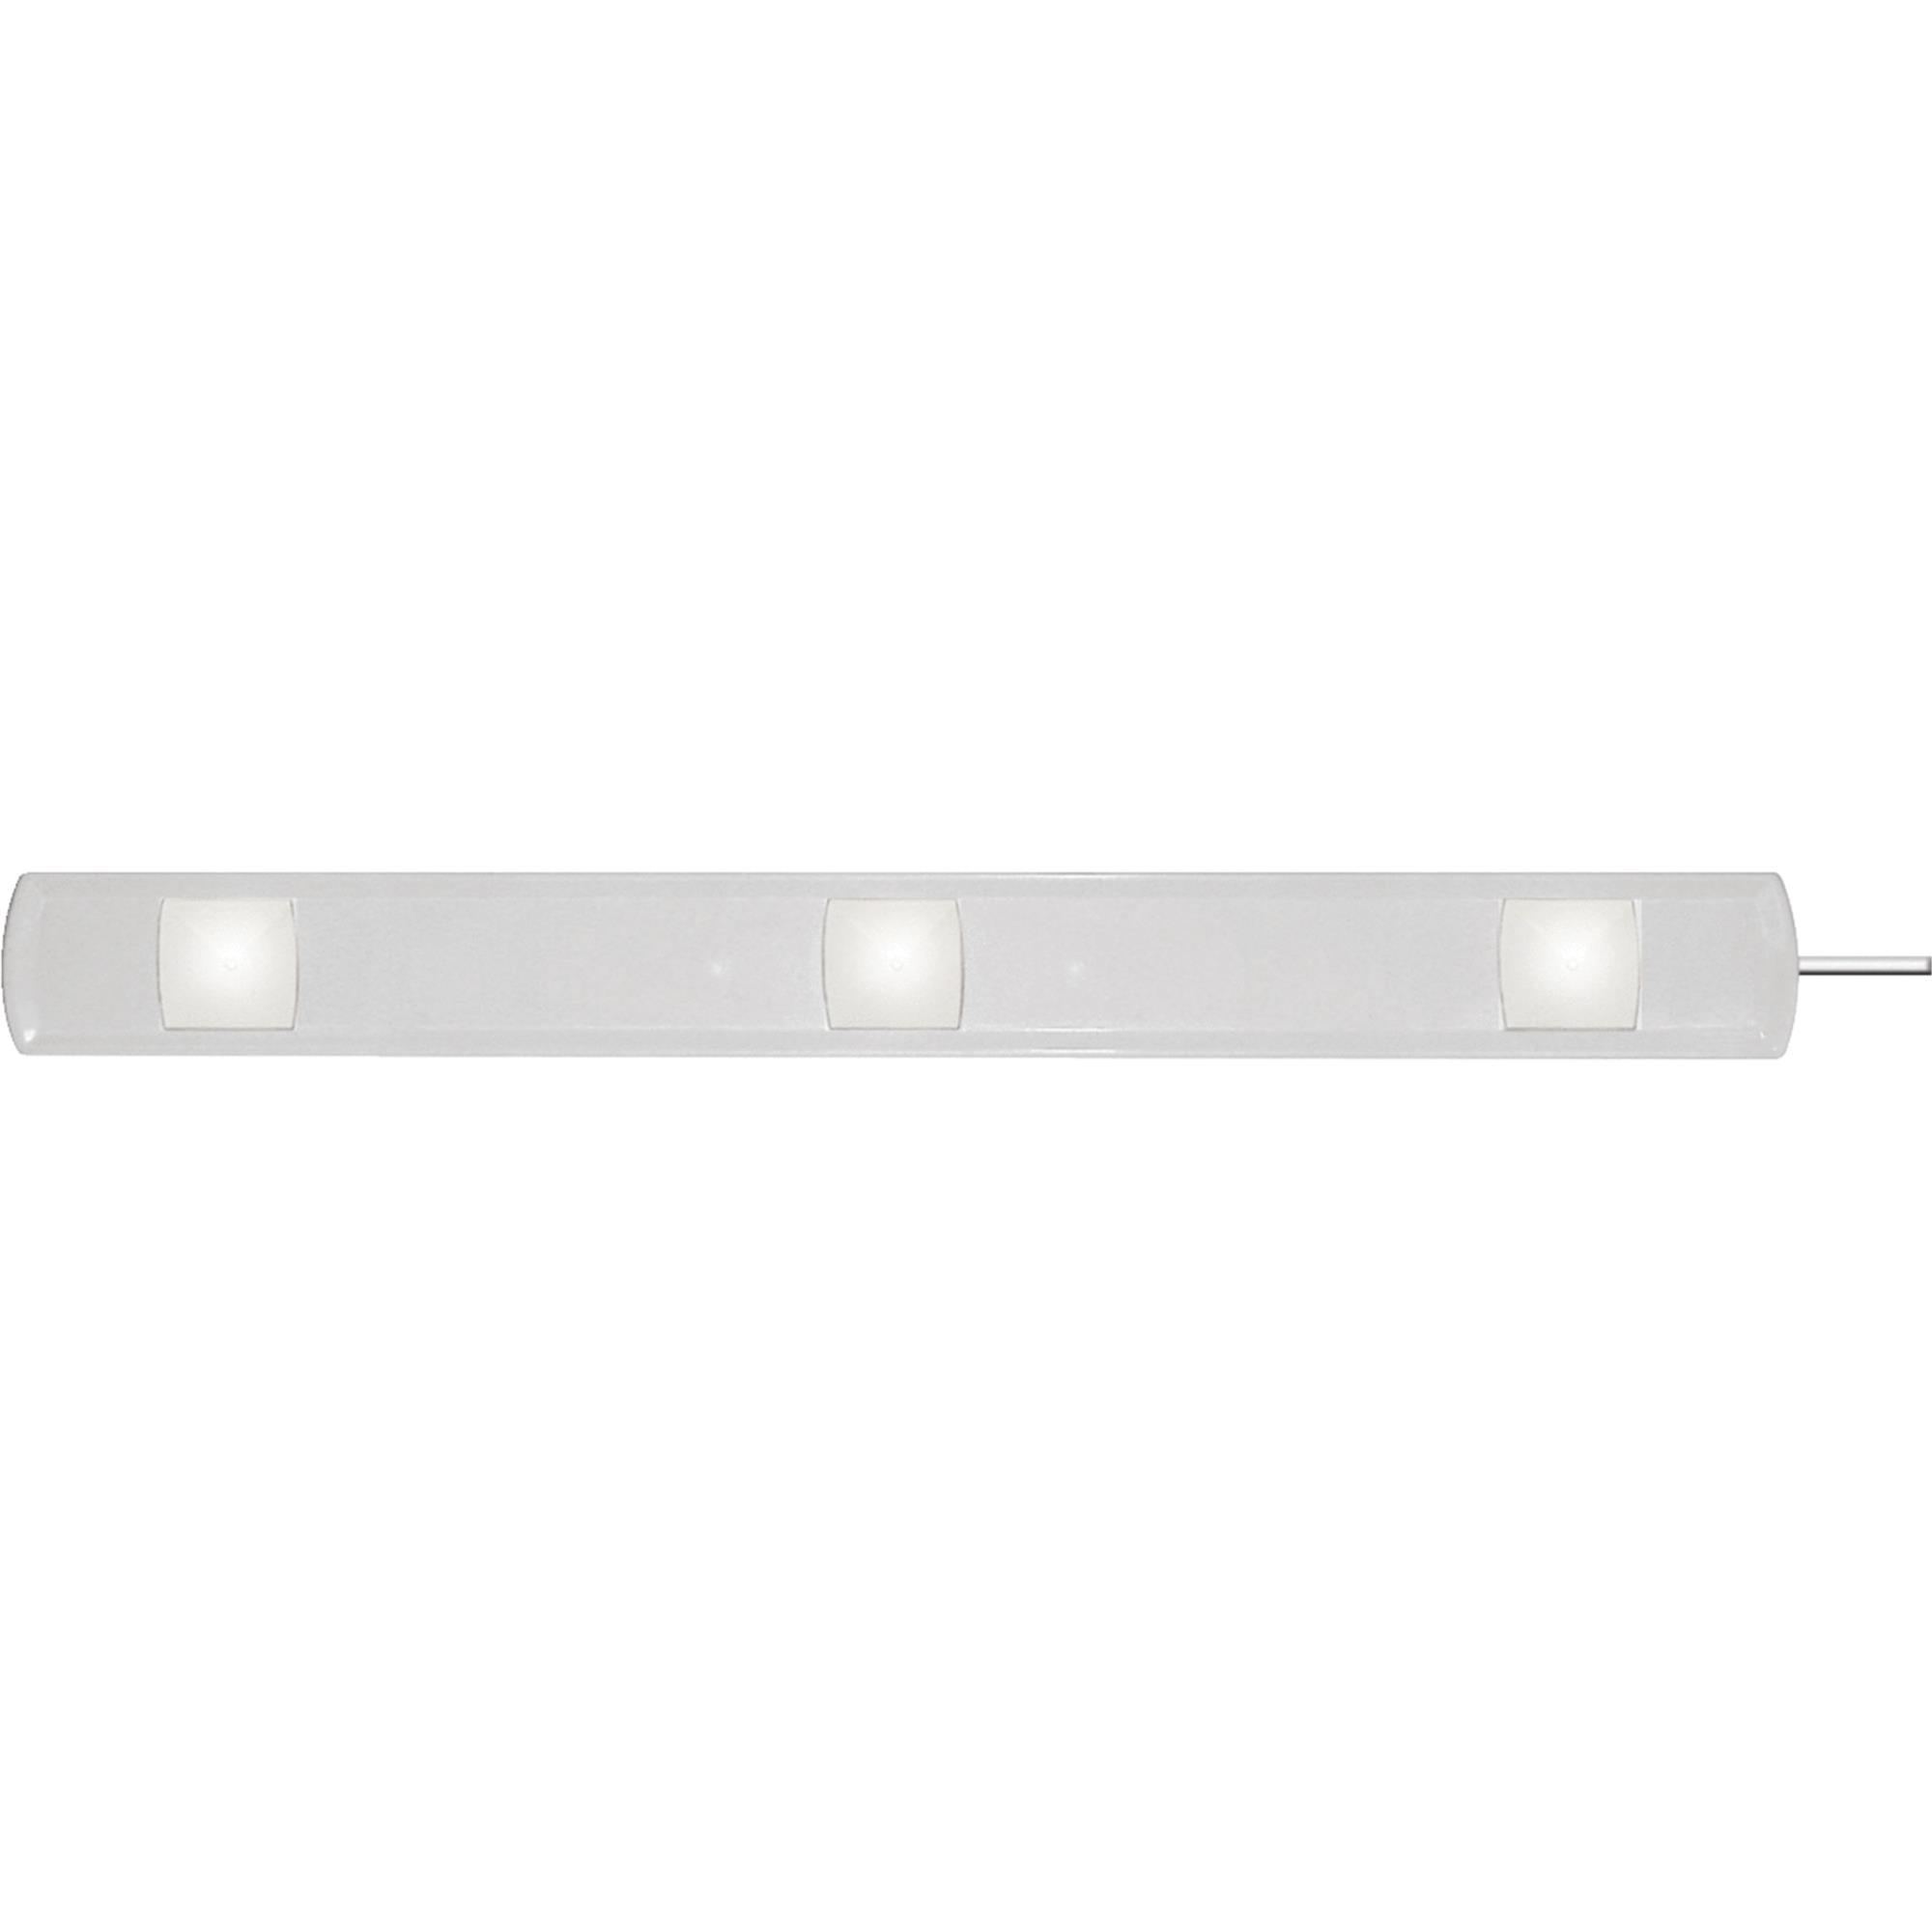 Good Earth Lighting Plug-In Linking LED Under Cabinet Light